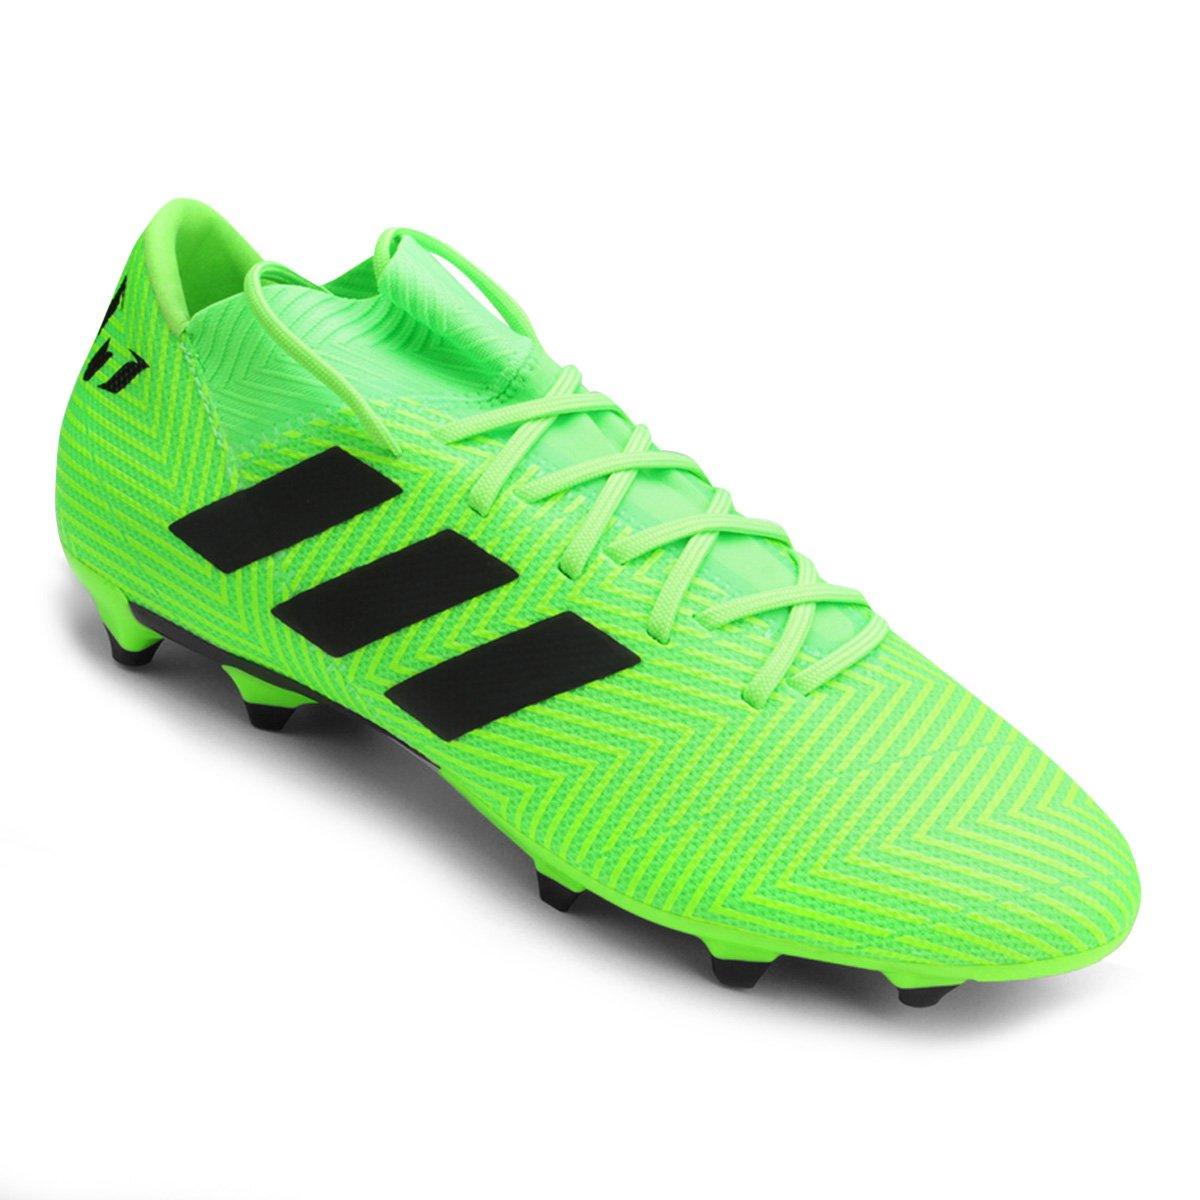 new style 97f84 a3e7b Chuteira Campo Adidas Nemeziz Messi 18 3 FG - Compre Agora   Allianz Parque  Shop